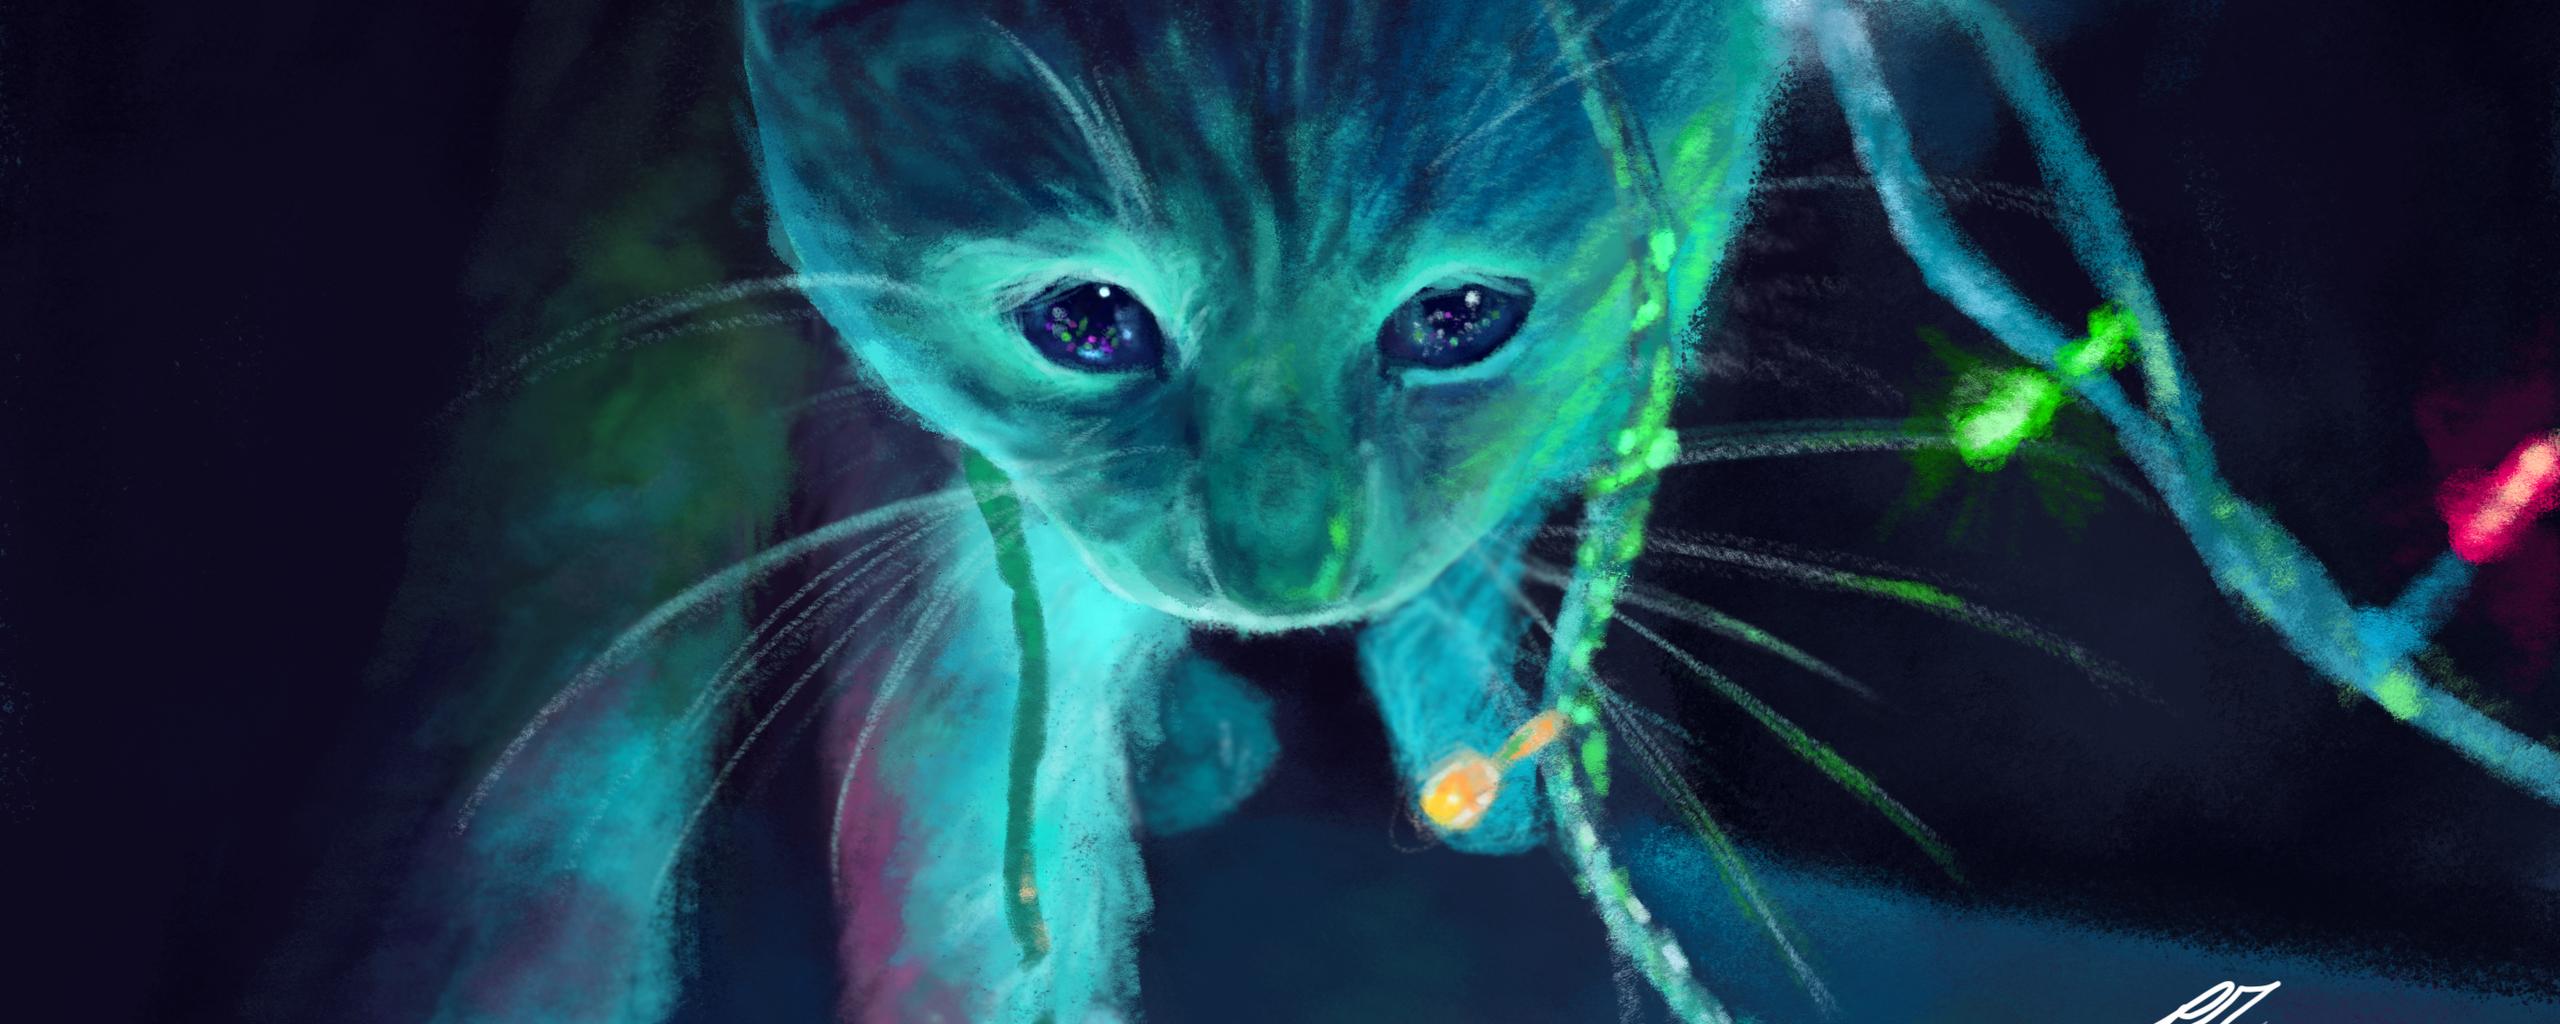 neon-cat-artwork-6w.jpg